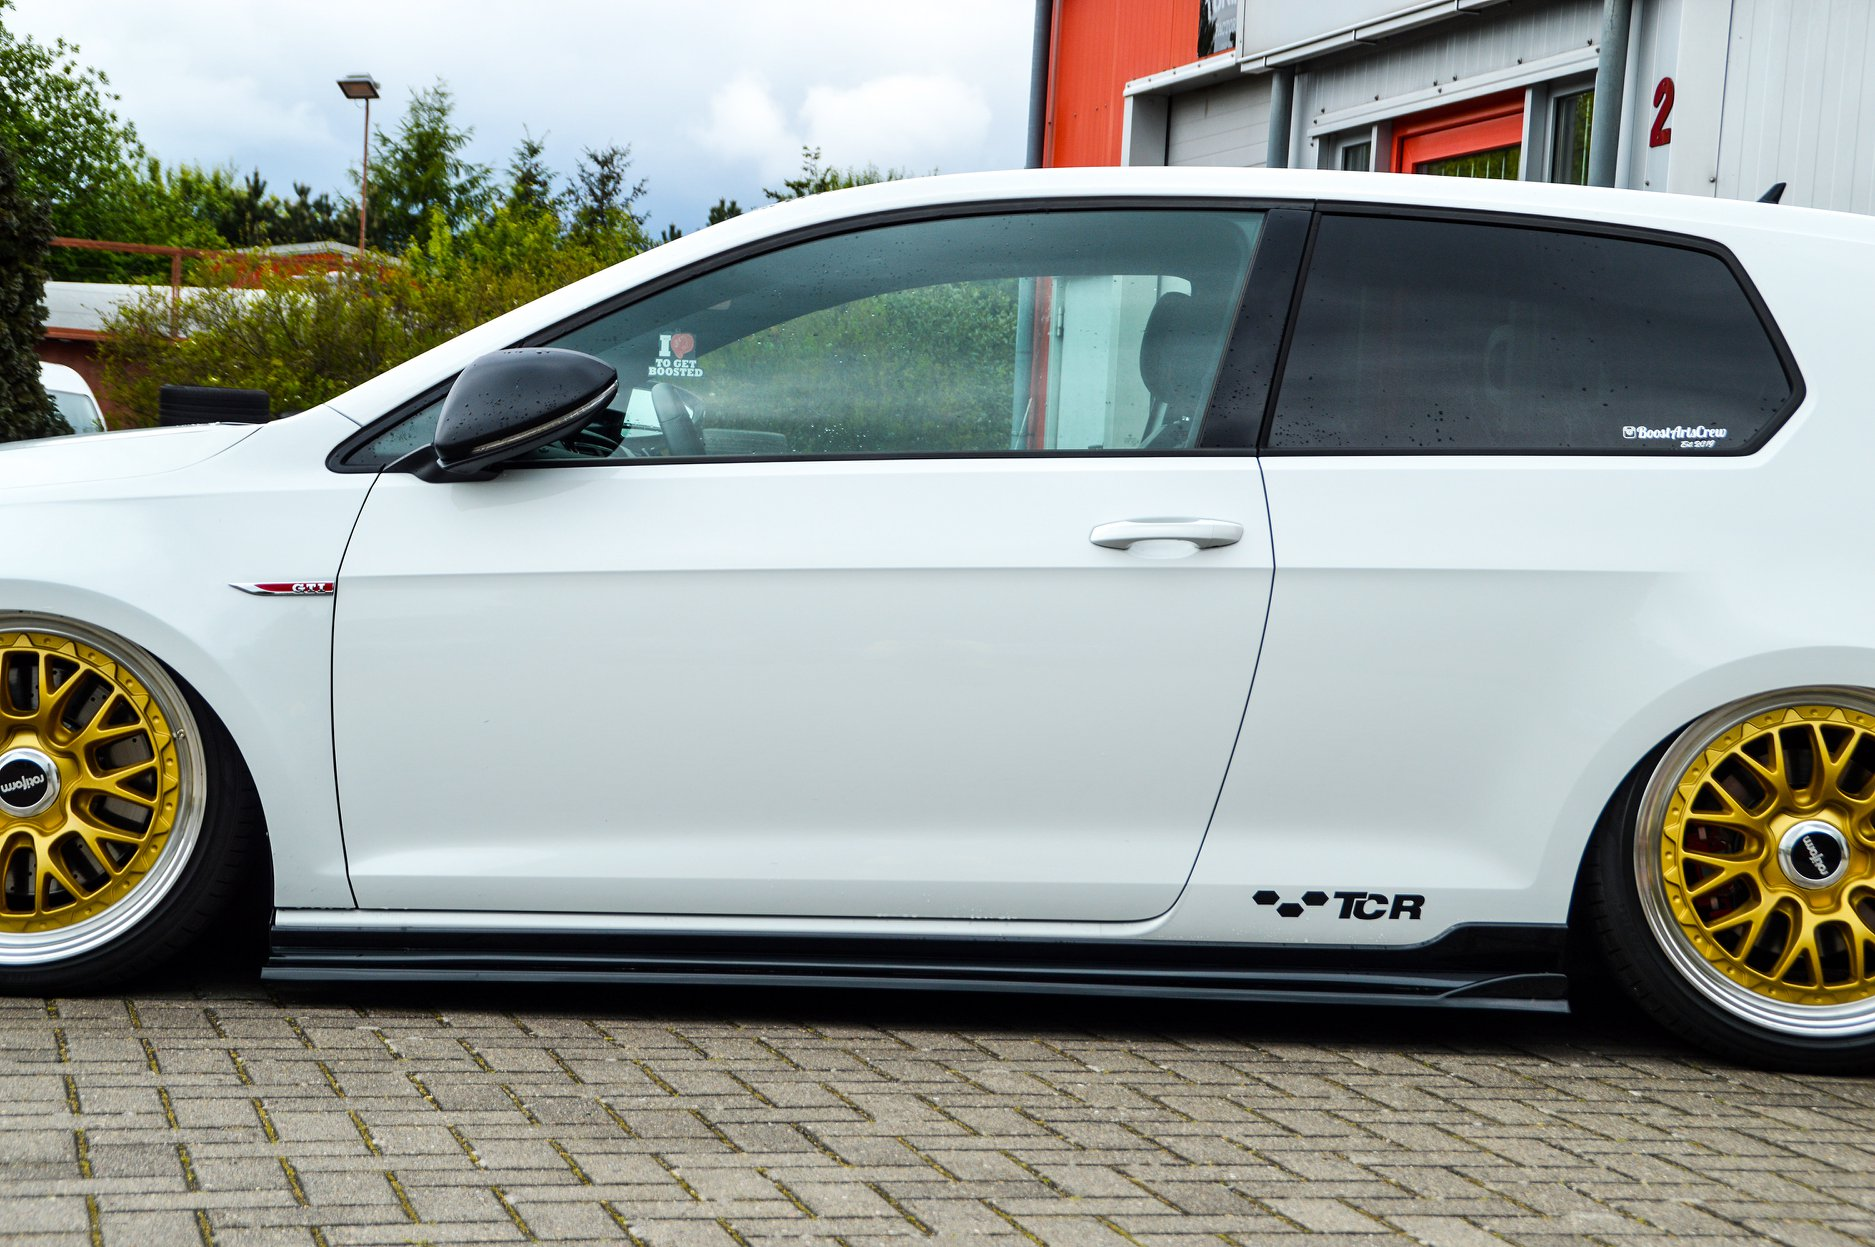 VW-Golf-7-GTI-TCR-by-Ingo-Noak-Tuning-11